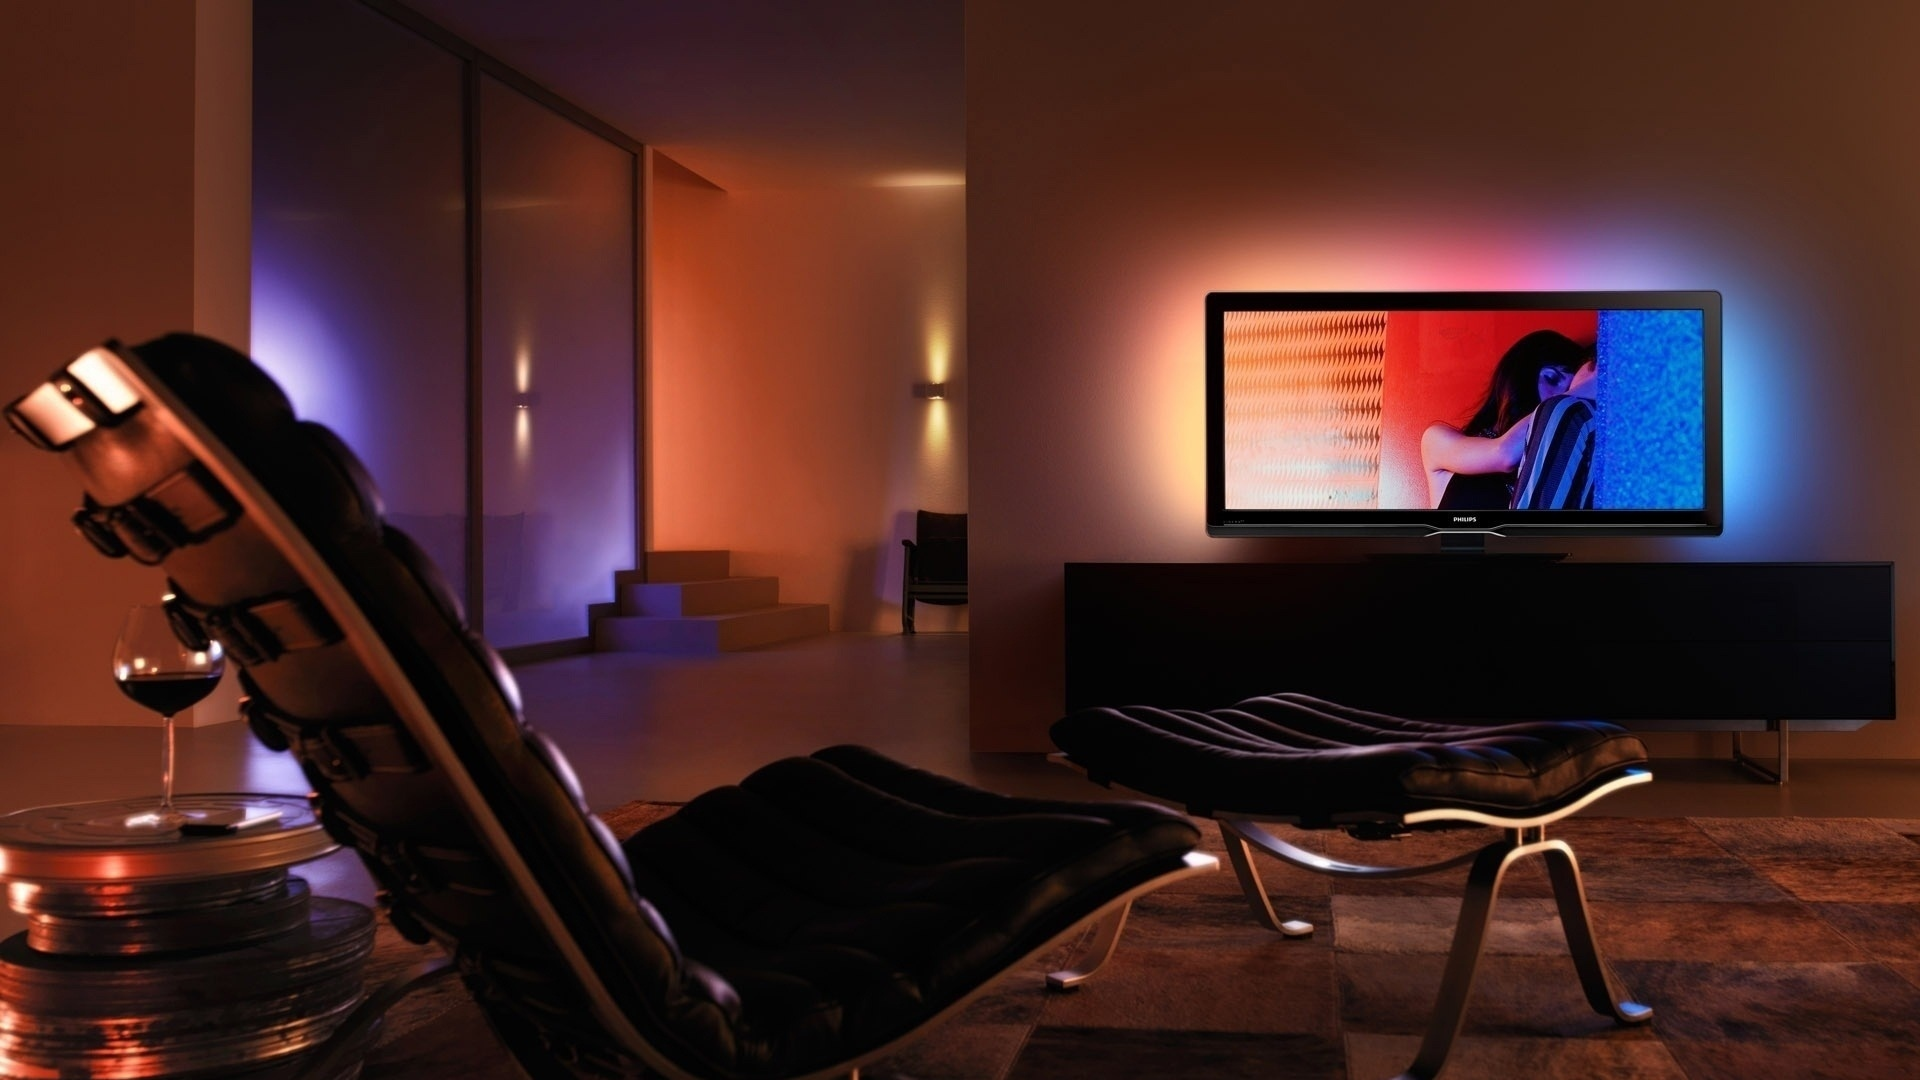 Living room interior design hd wall - Home Theater Wallpaper For Desktop Wallpapersafari